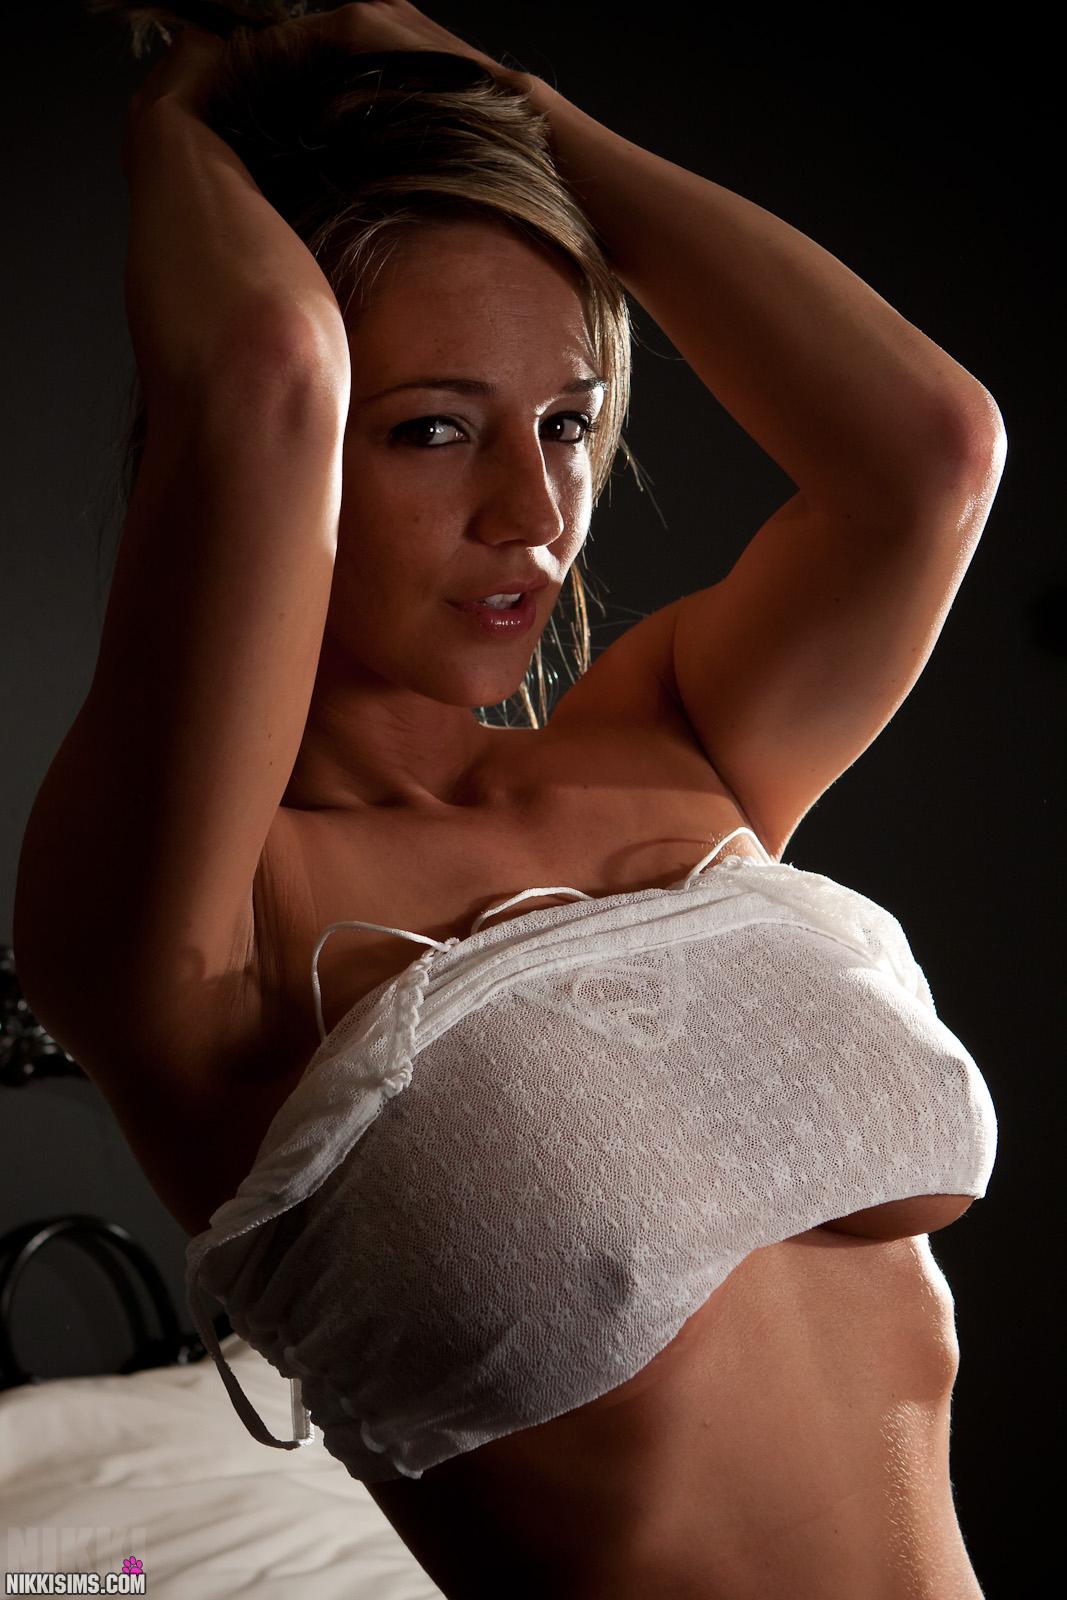 Nikki sims erotic images hentay pics